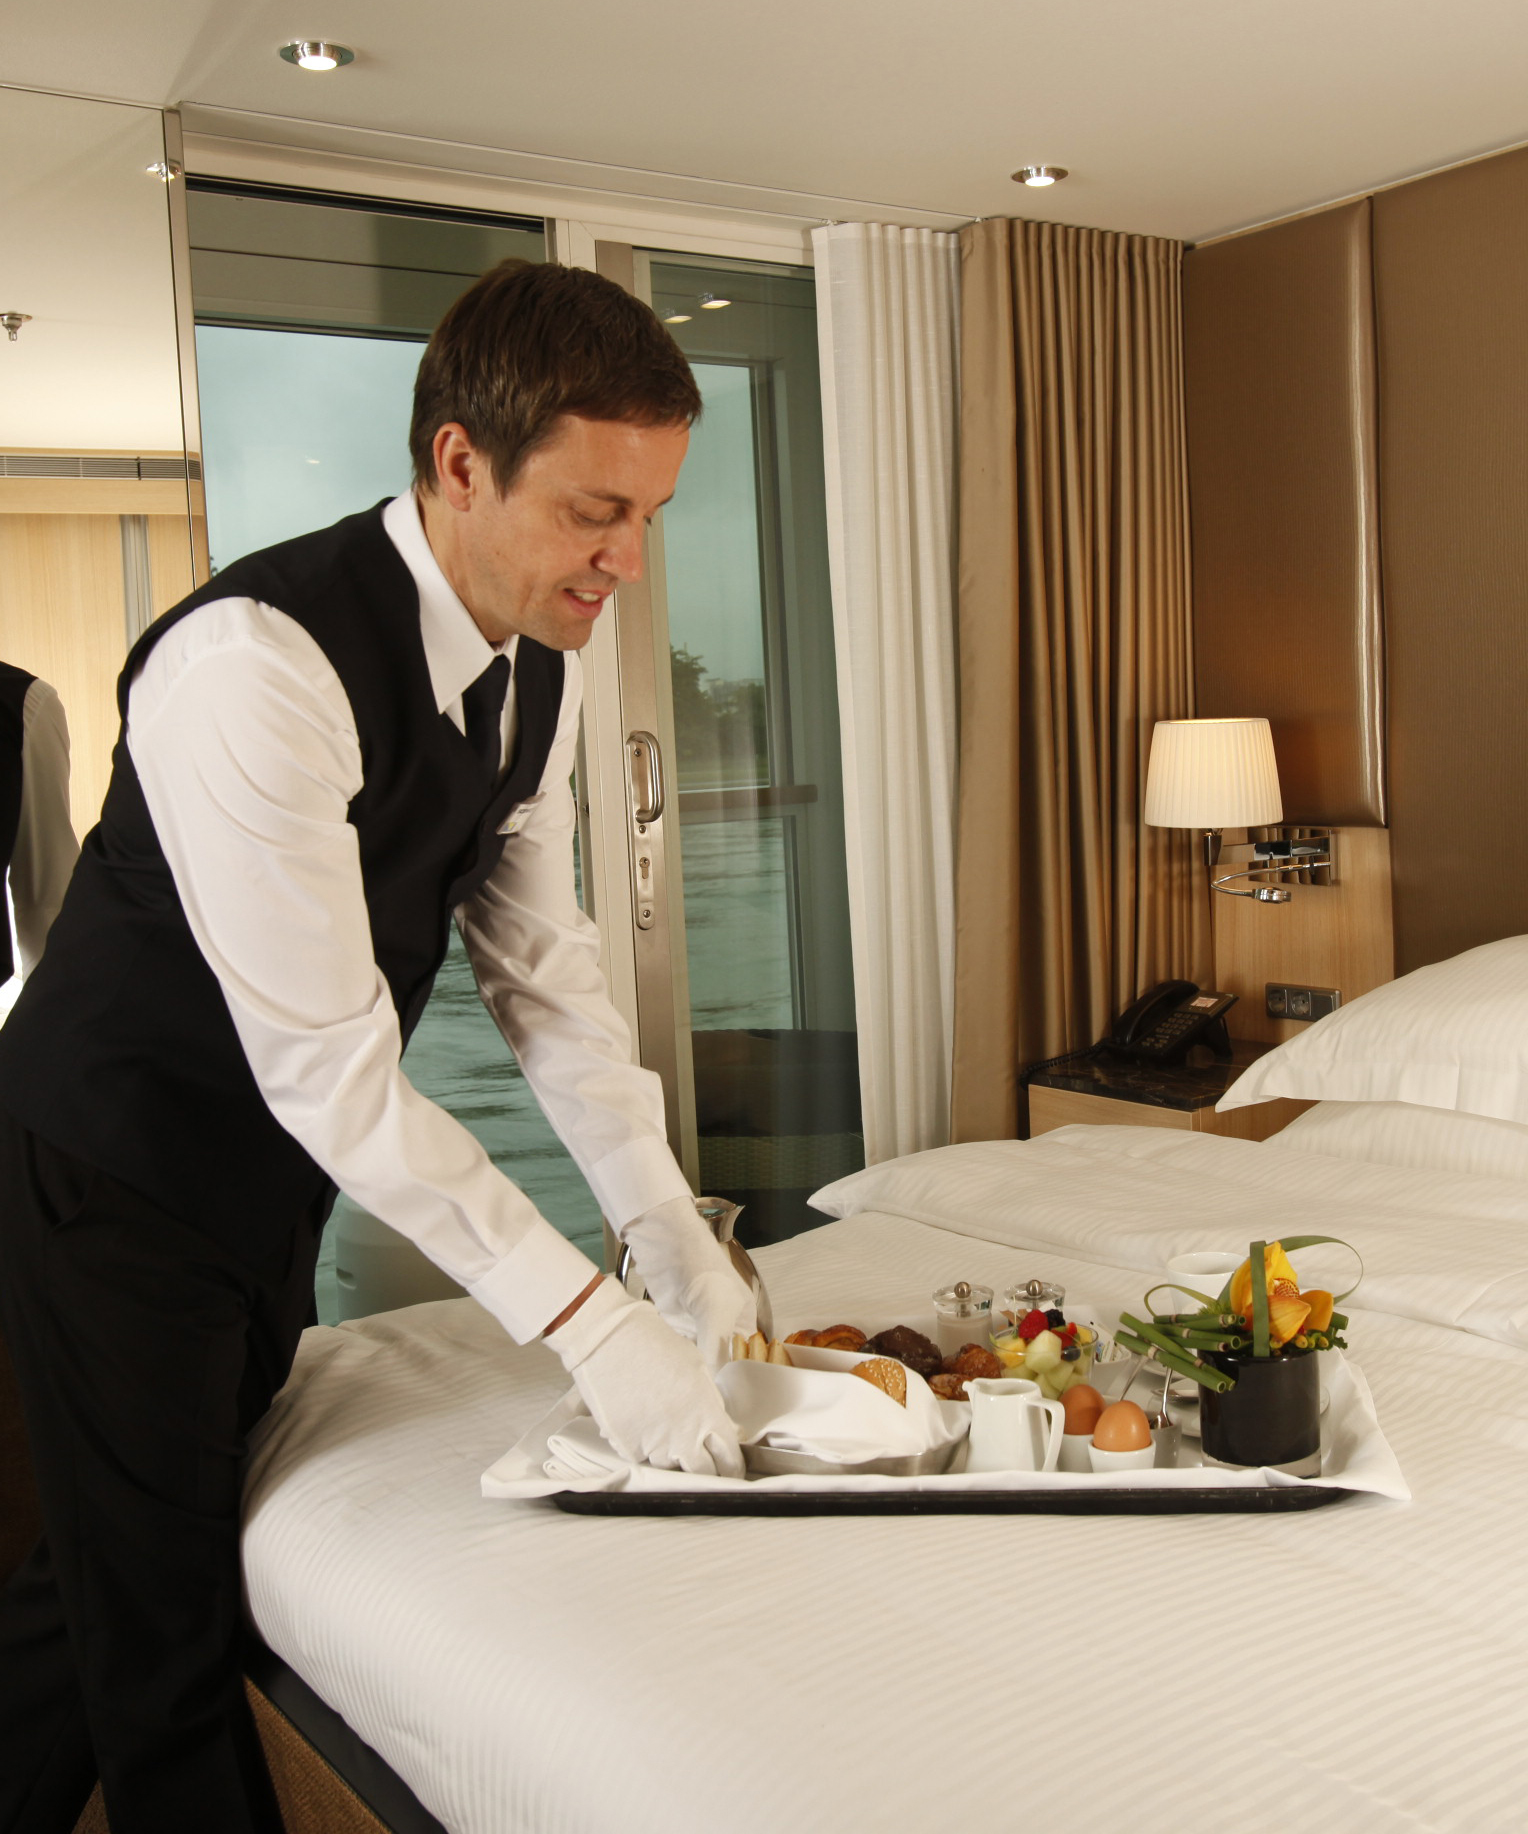 Scenic Jasper Room Service Dining _MG_9738r.jpg